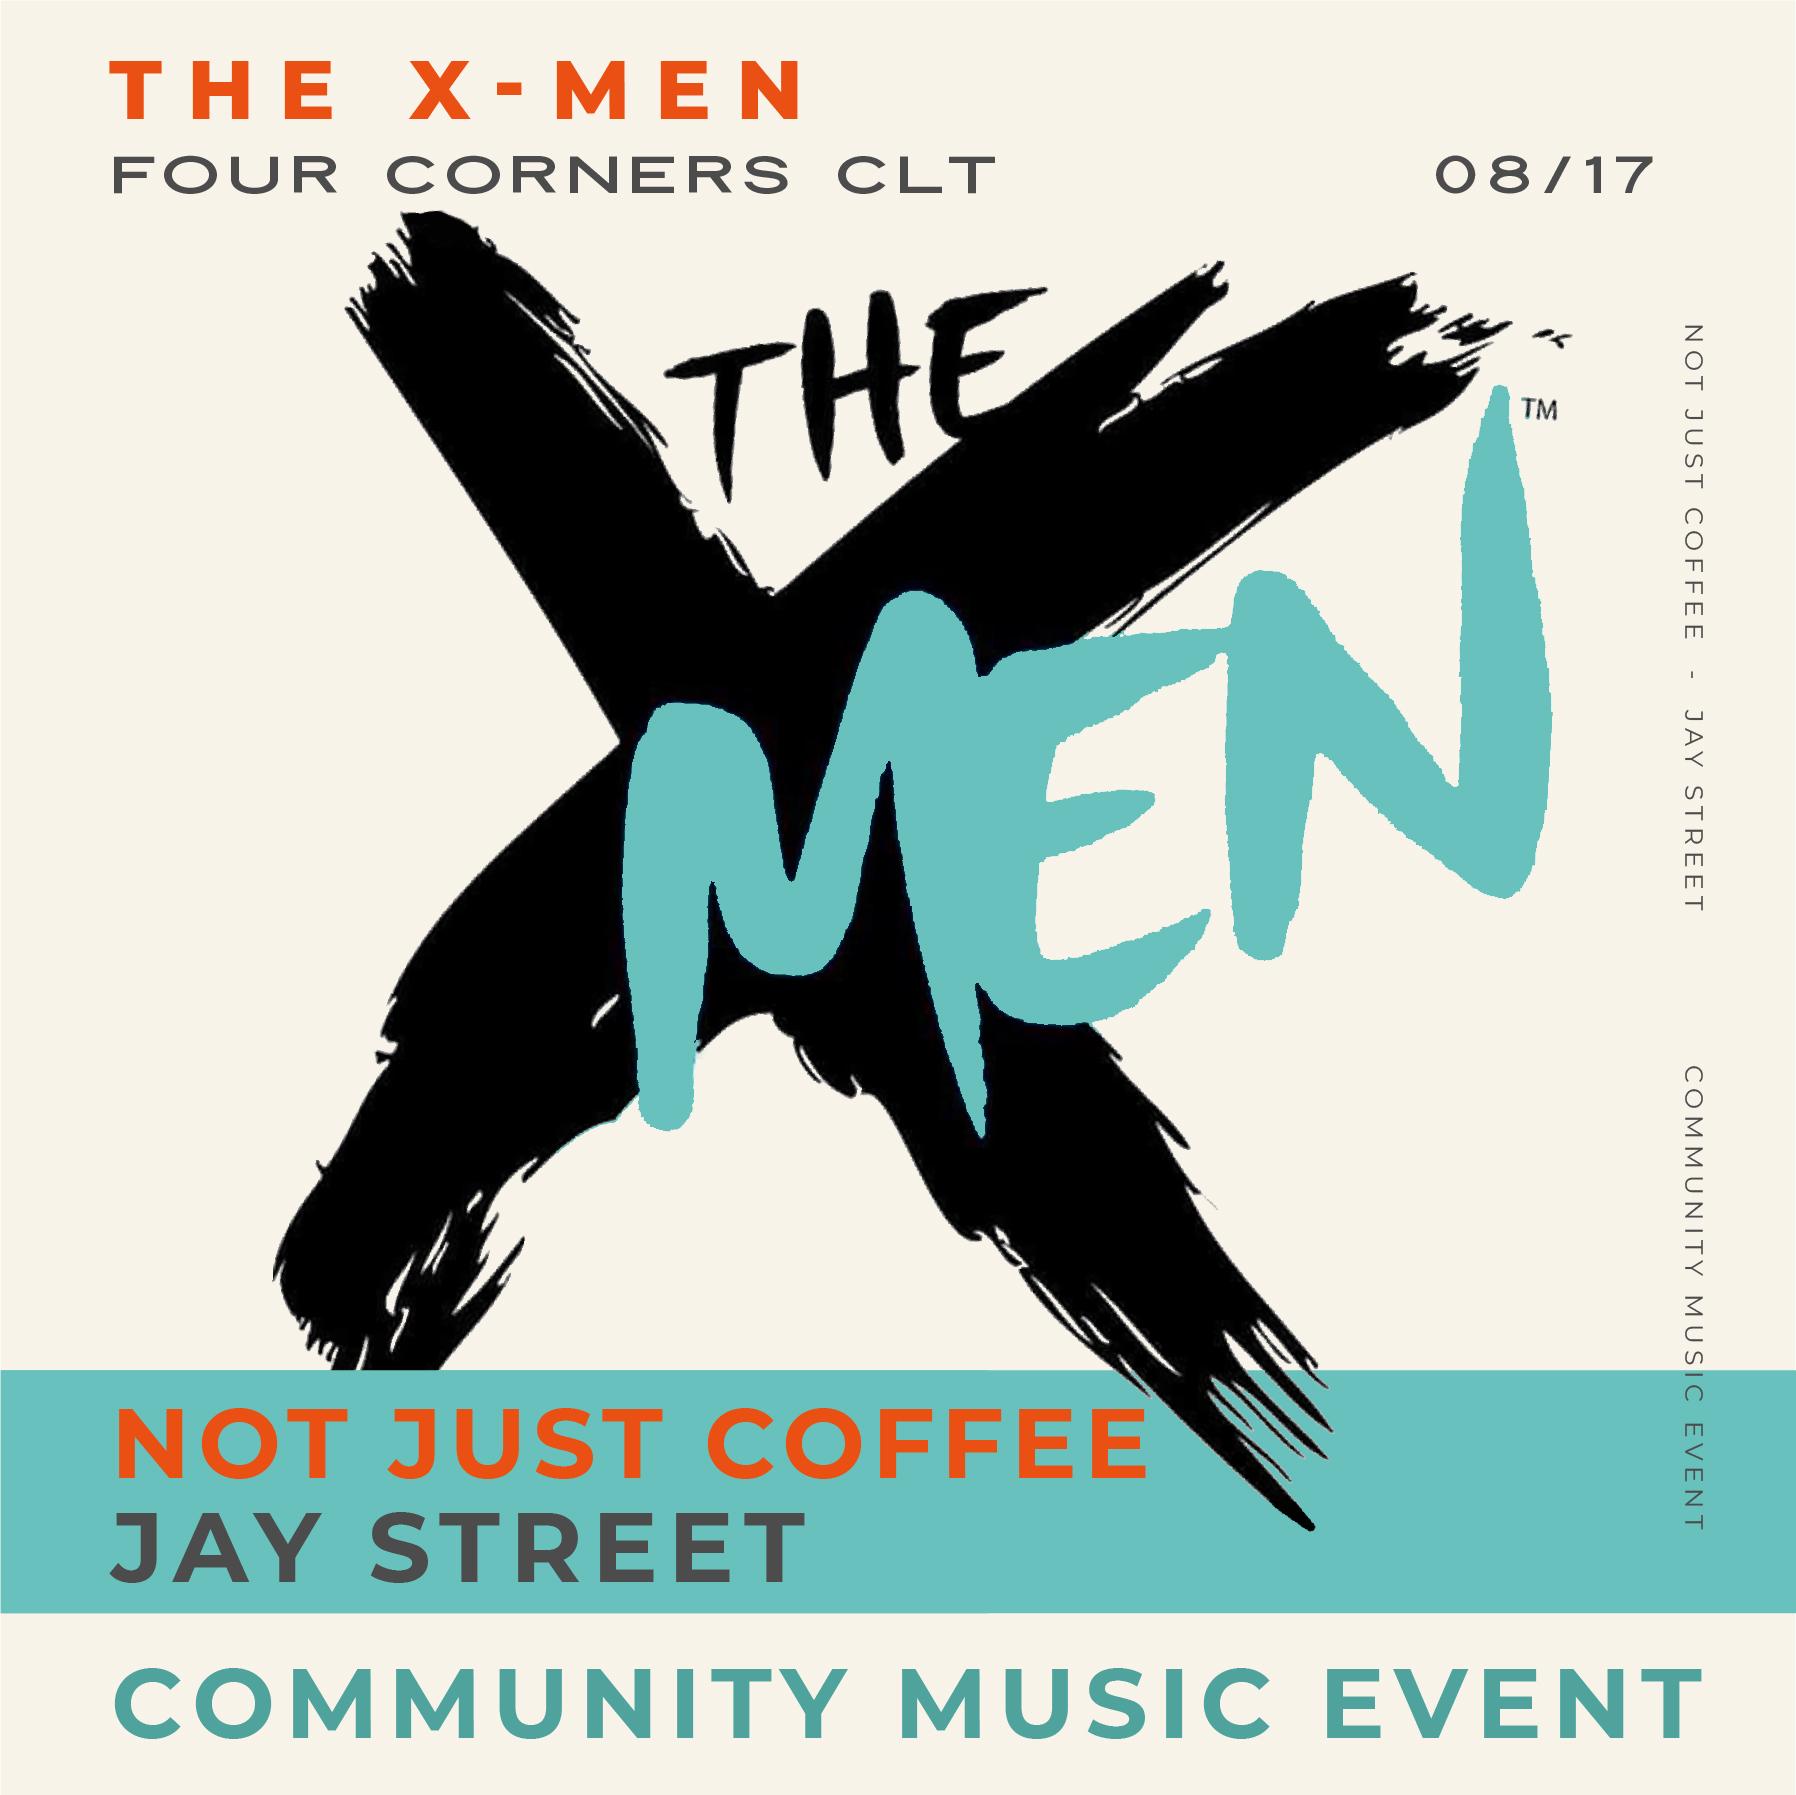 Four Corners Poster Art_XMEN_X-Men.jpg